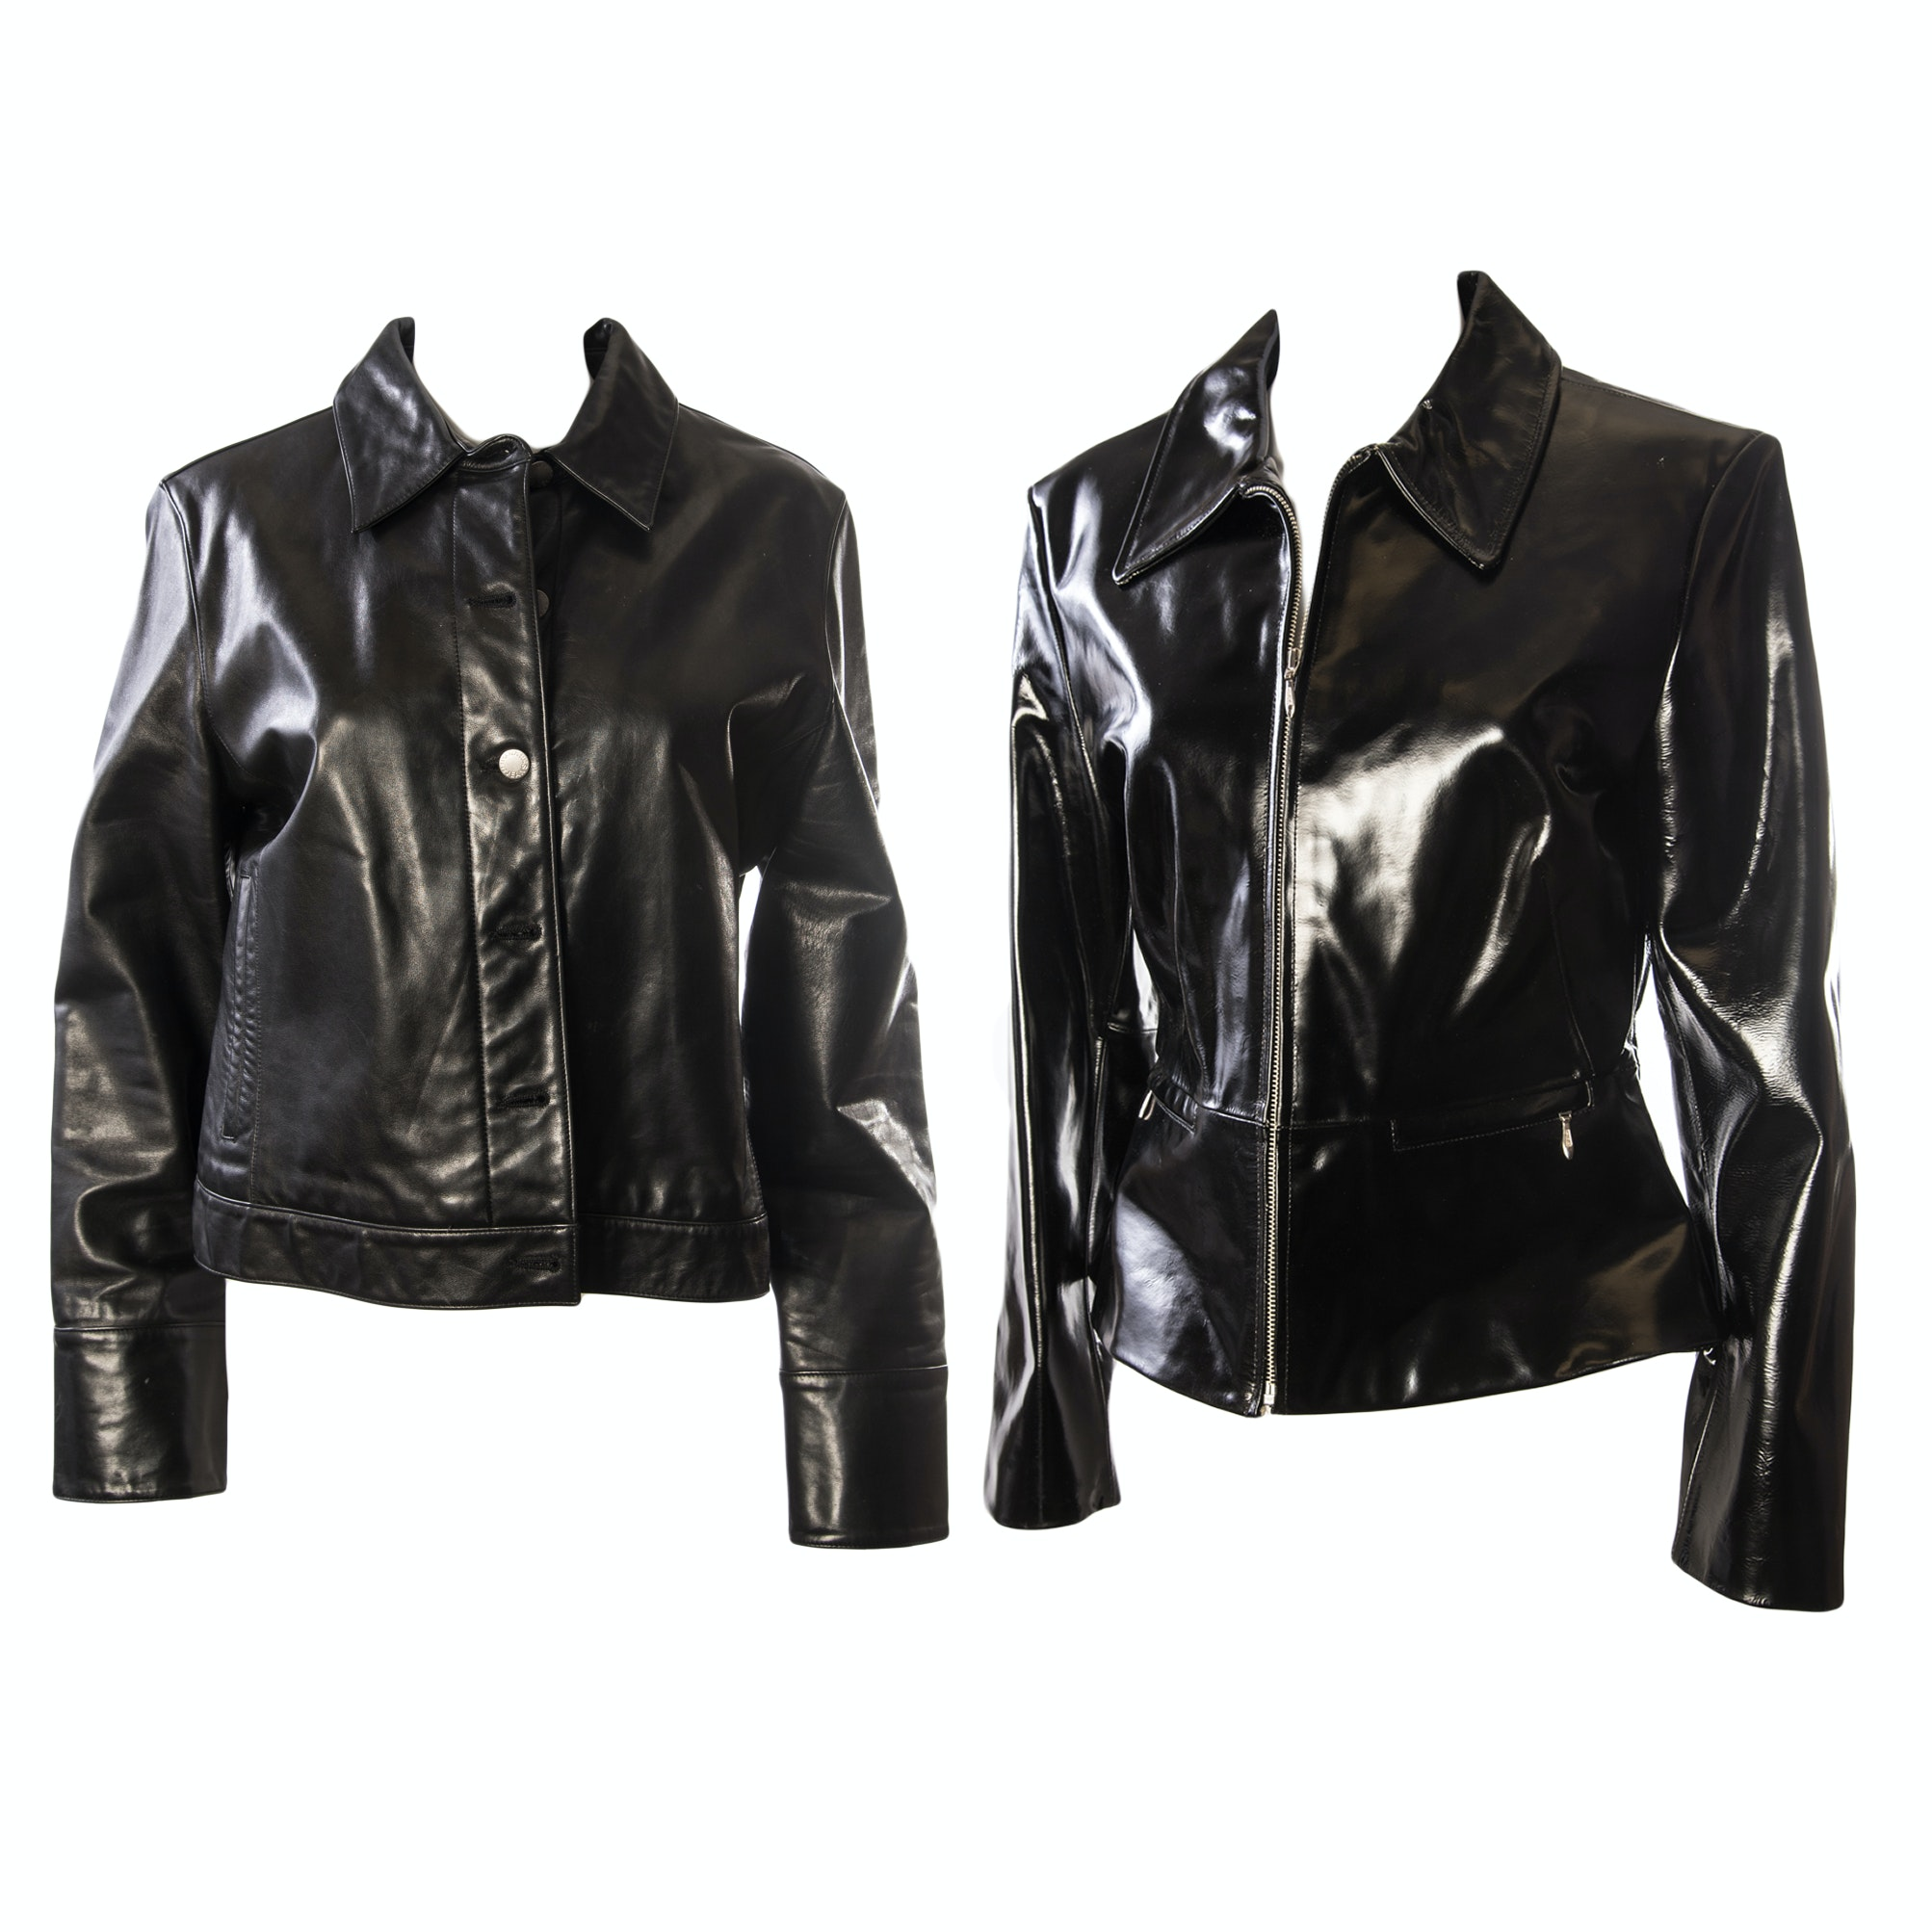 Women's Banana Republic Leather Jackets